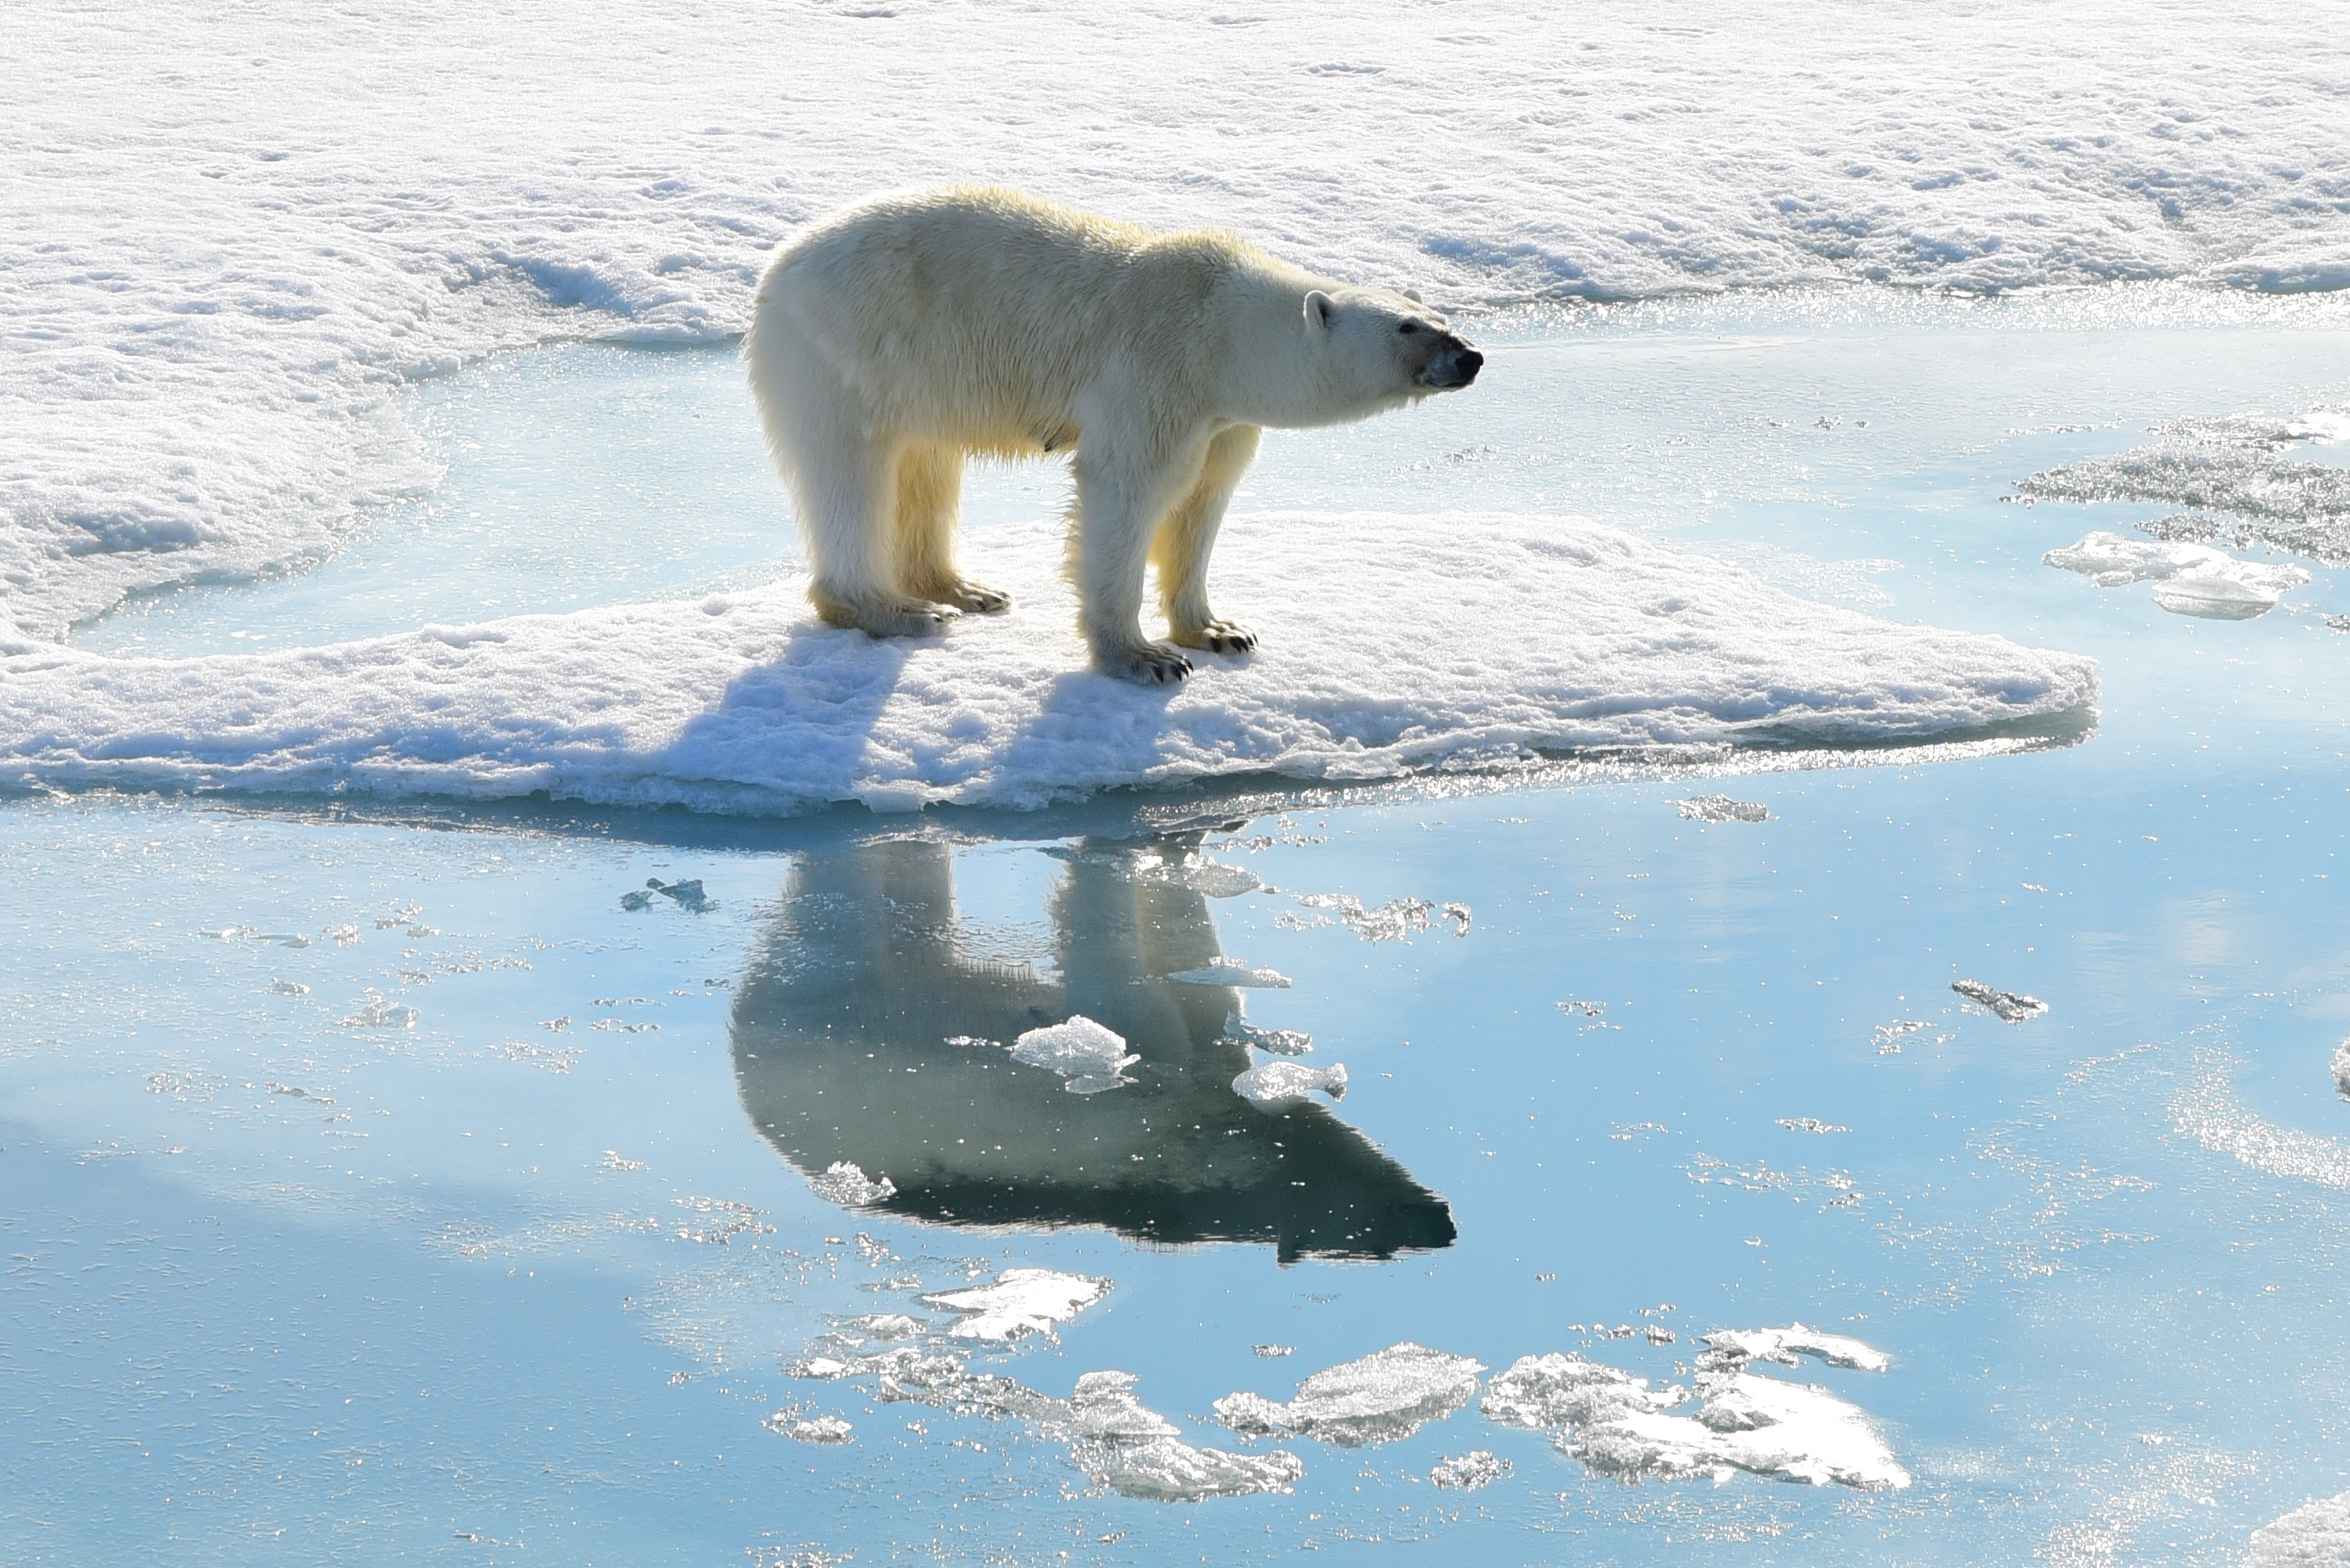 Polar Bear, Svalbard 2015